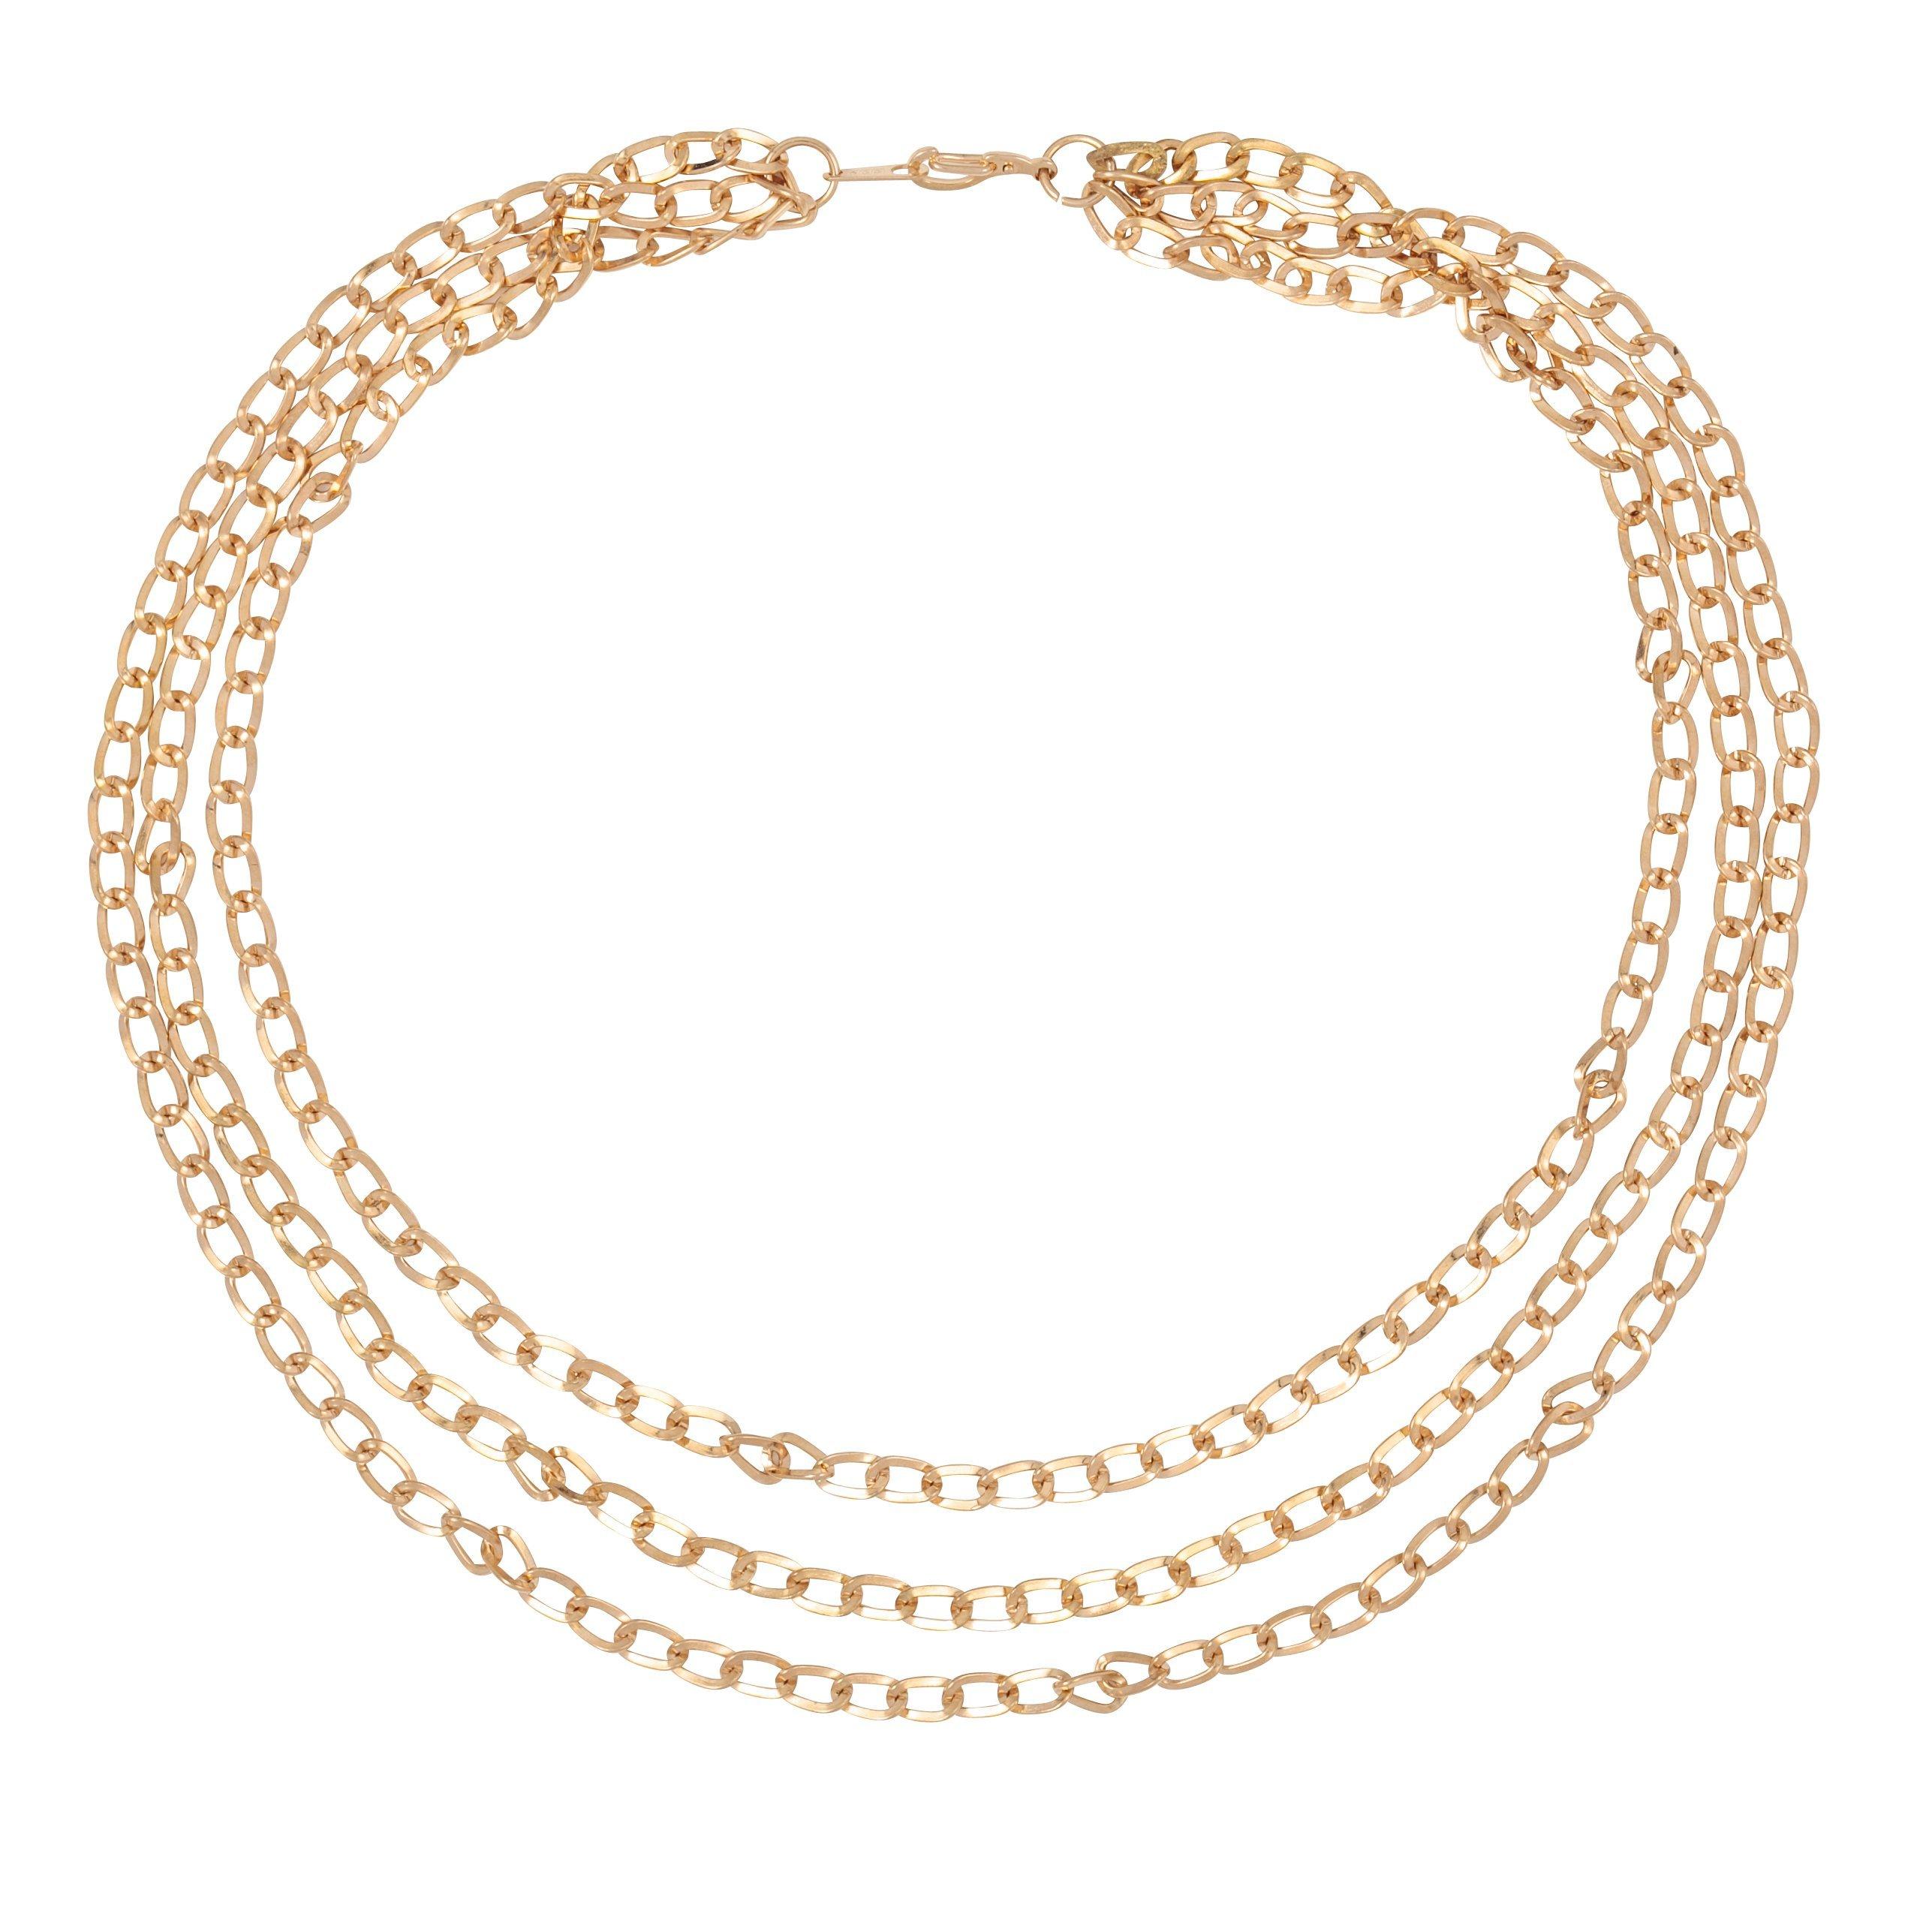 SUSAN CAPLAN VINTAGE 1990S VINTAGE GOLD PLATED MULTICHAIN NECKLACE